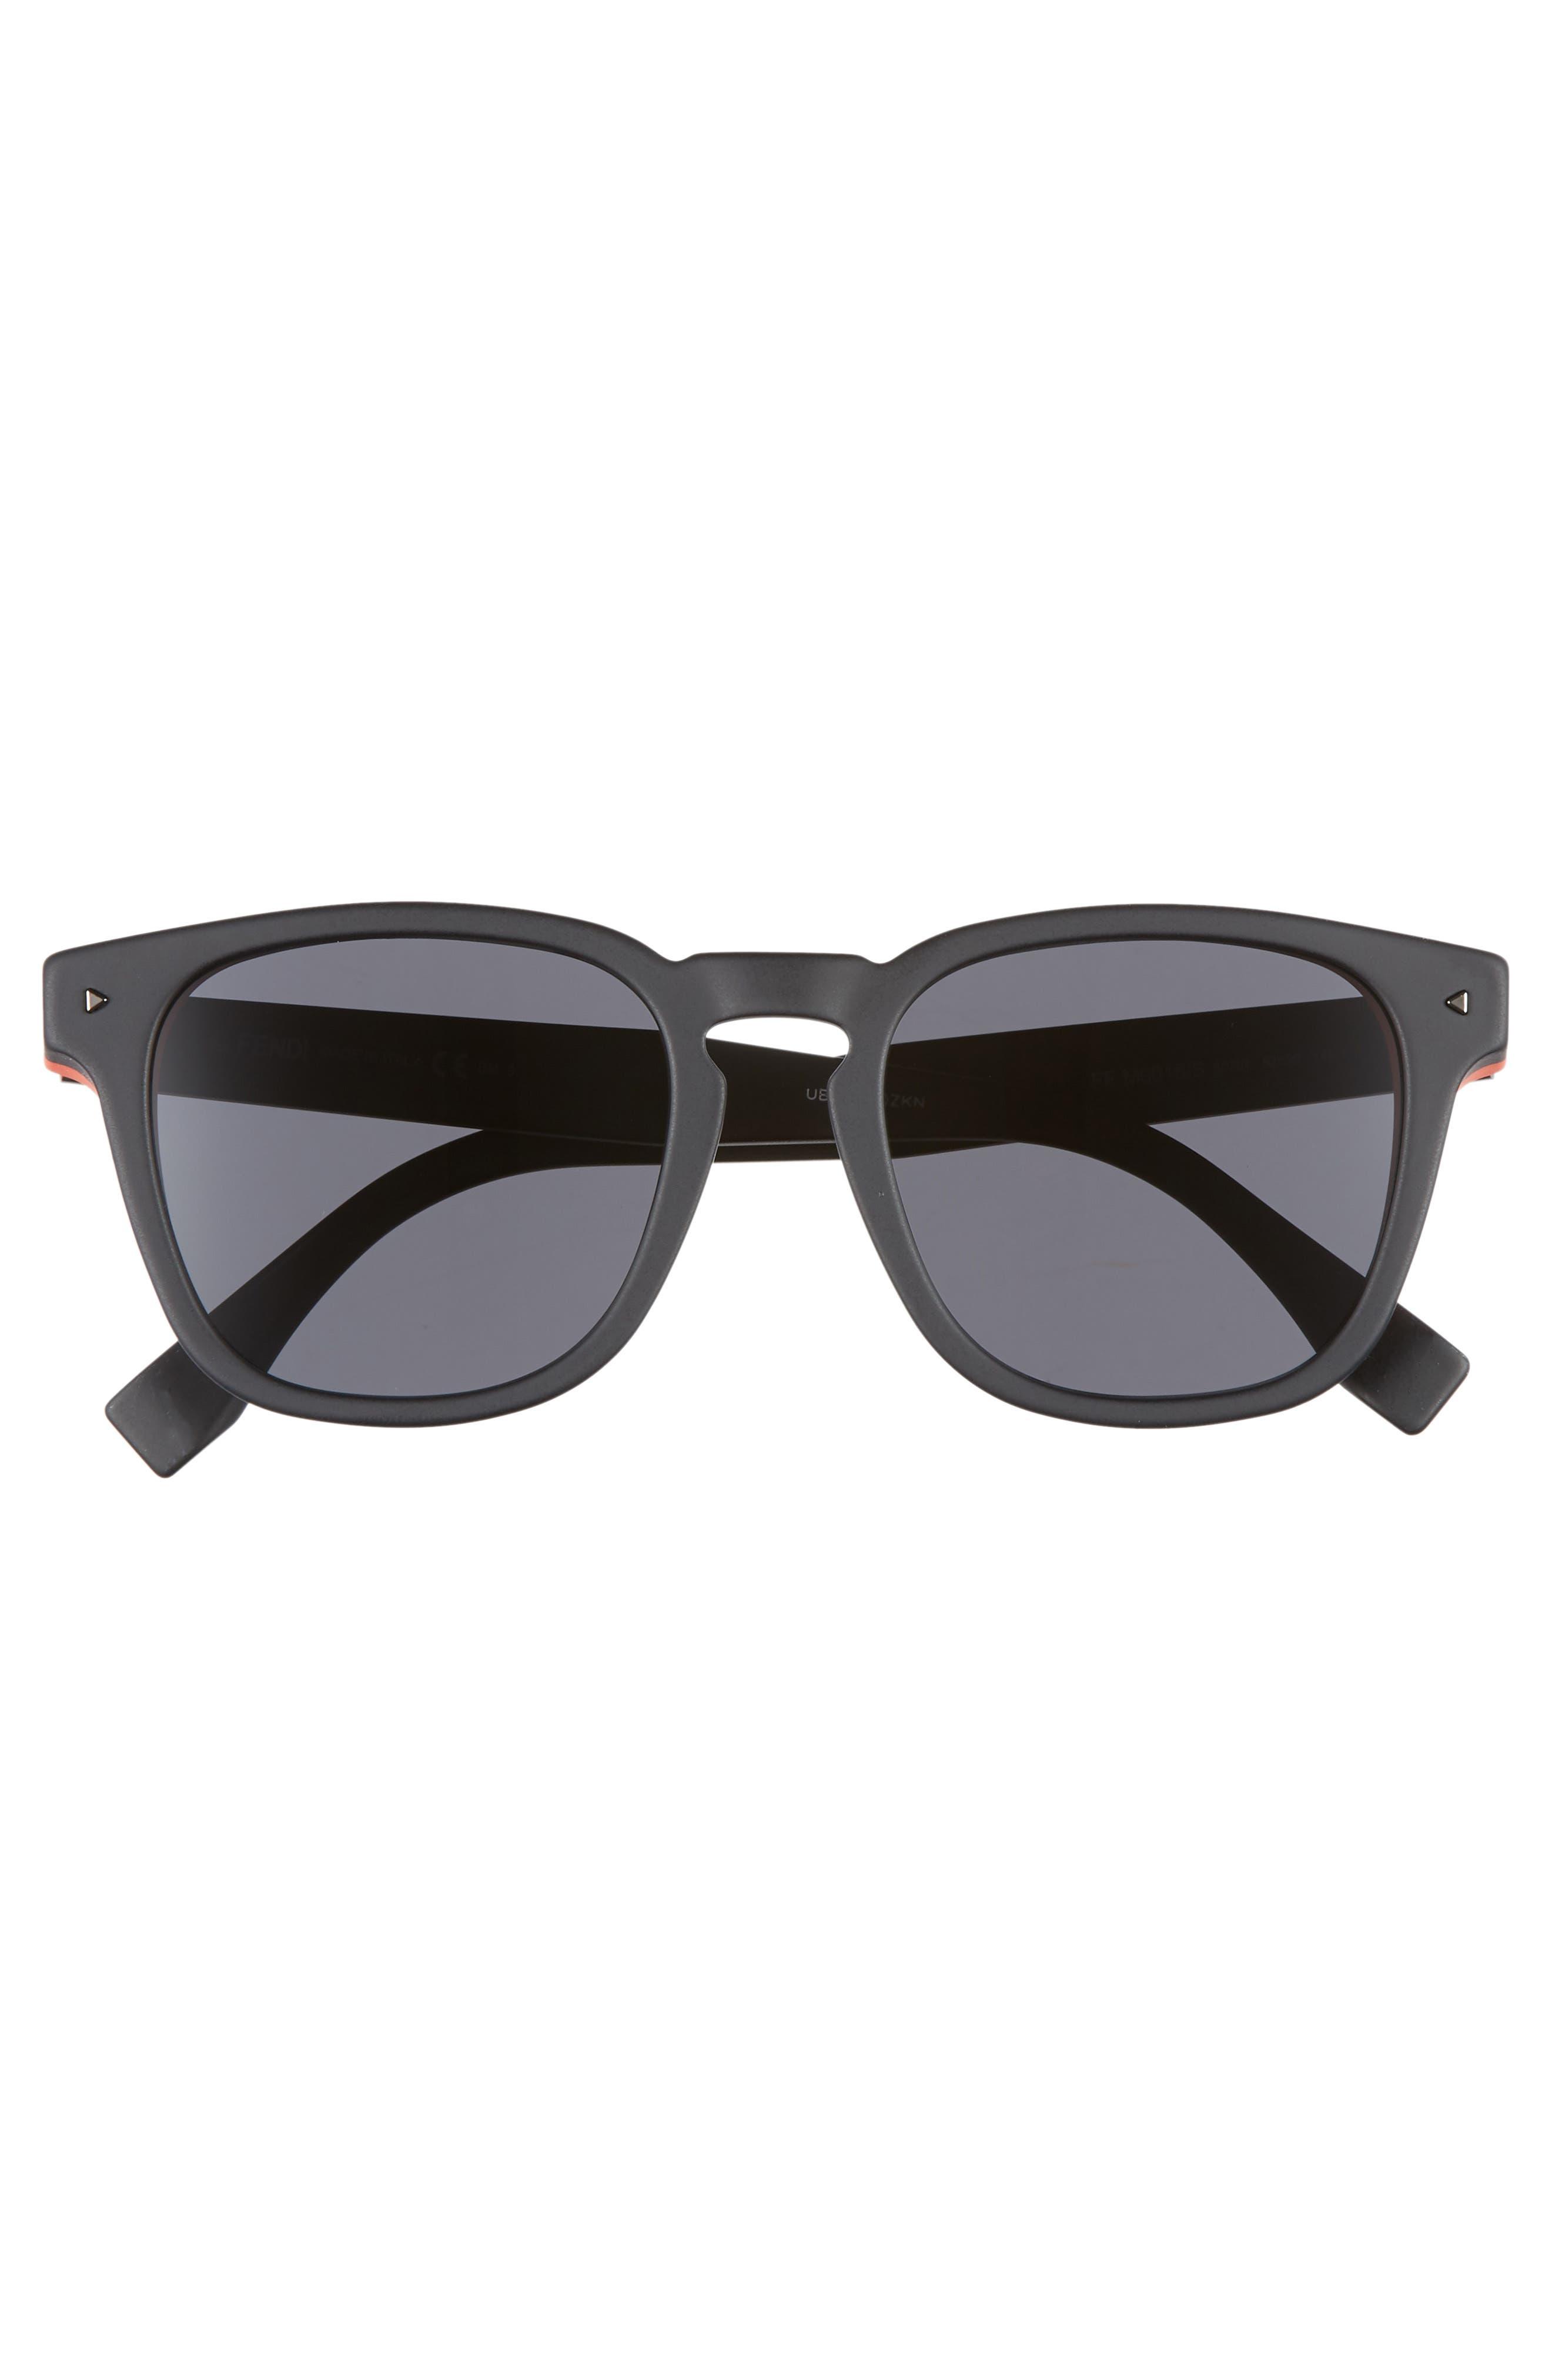 52mm Sunglasses,                             Alternate thumbnail 3, color,                             BLACK